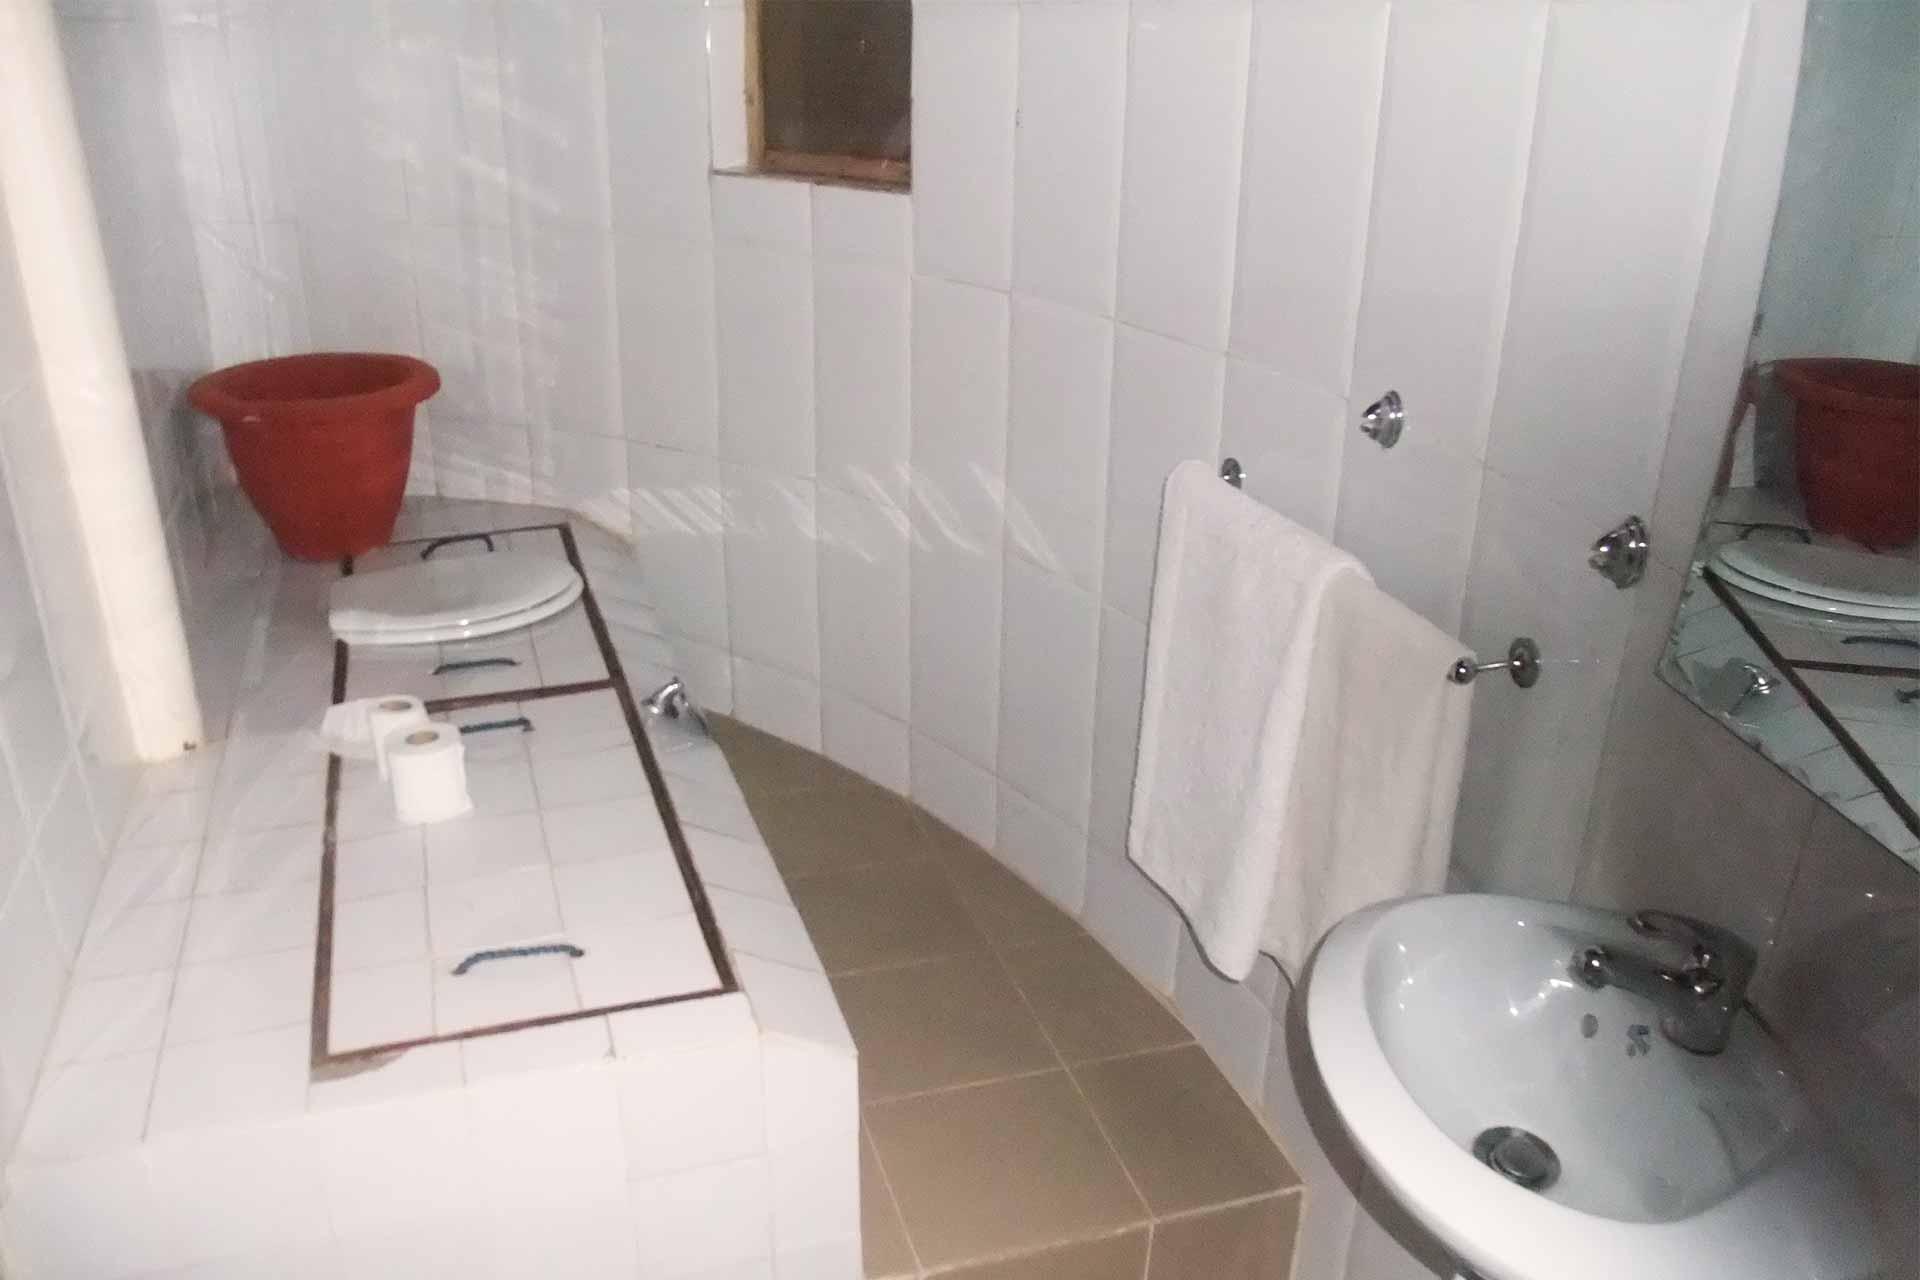 Bathroom accommodation | interior | ensuite bathroom